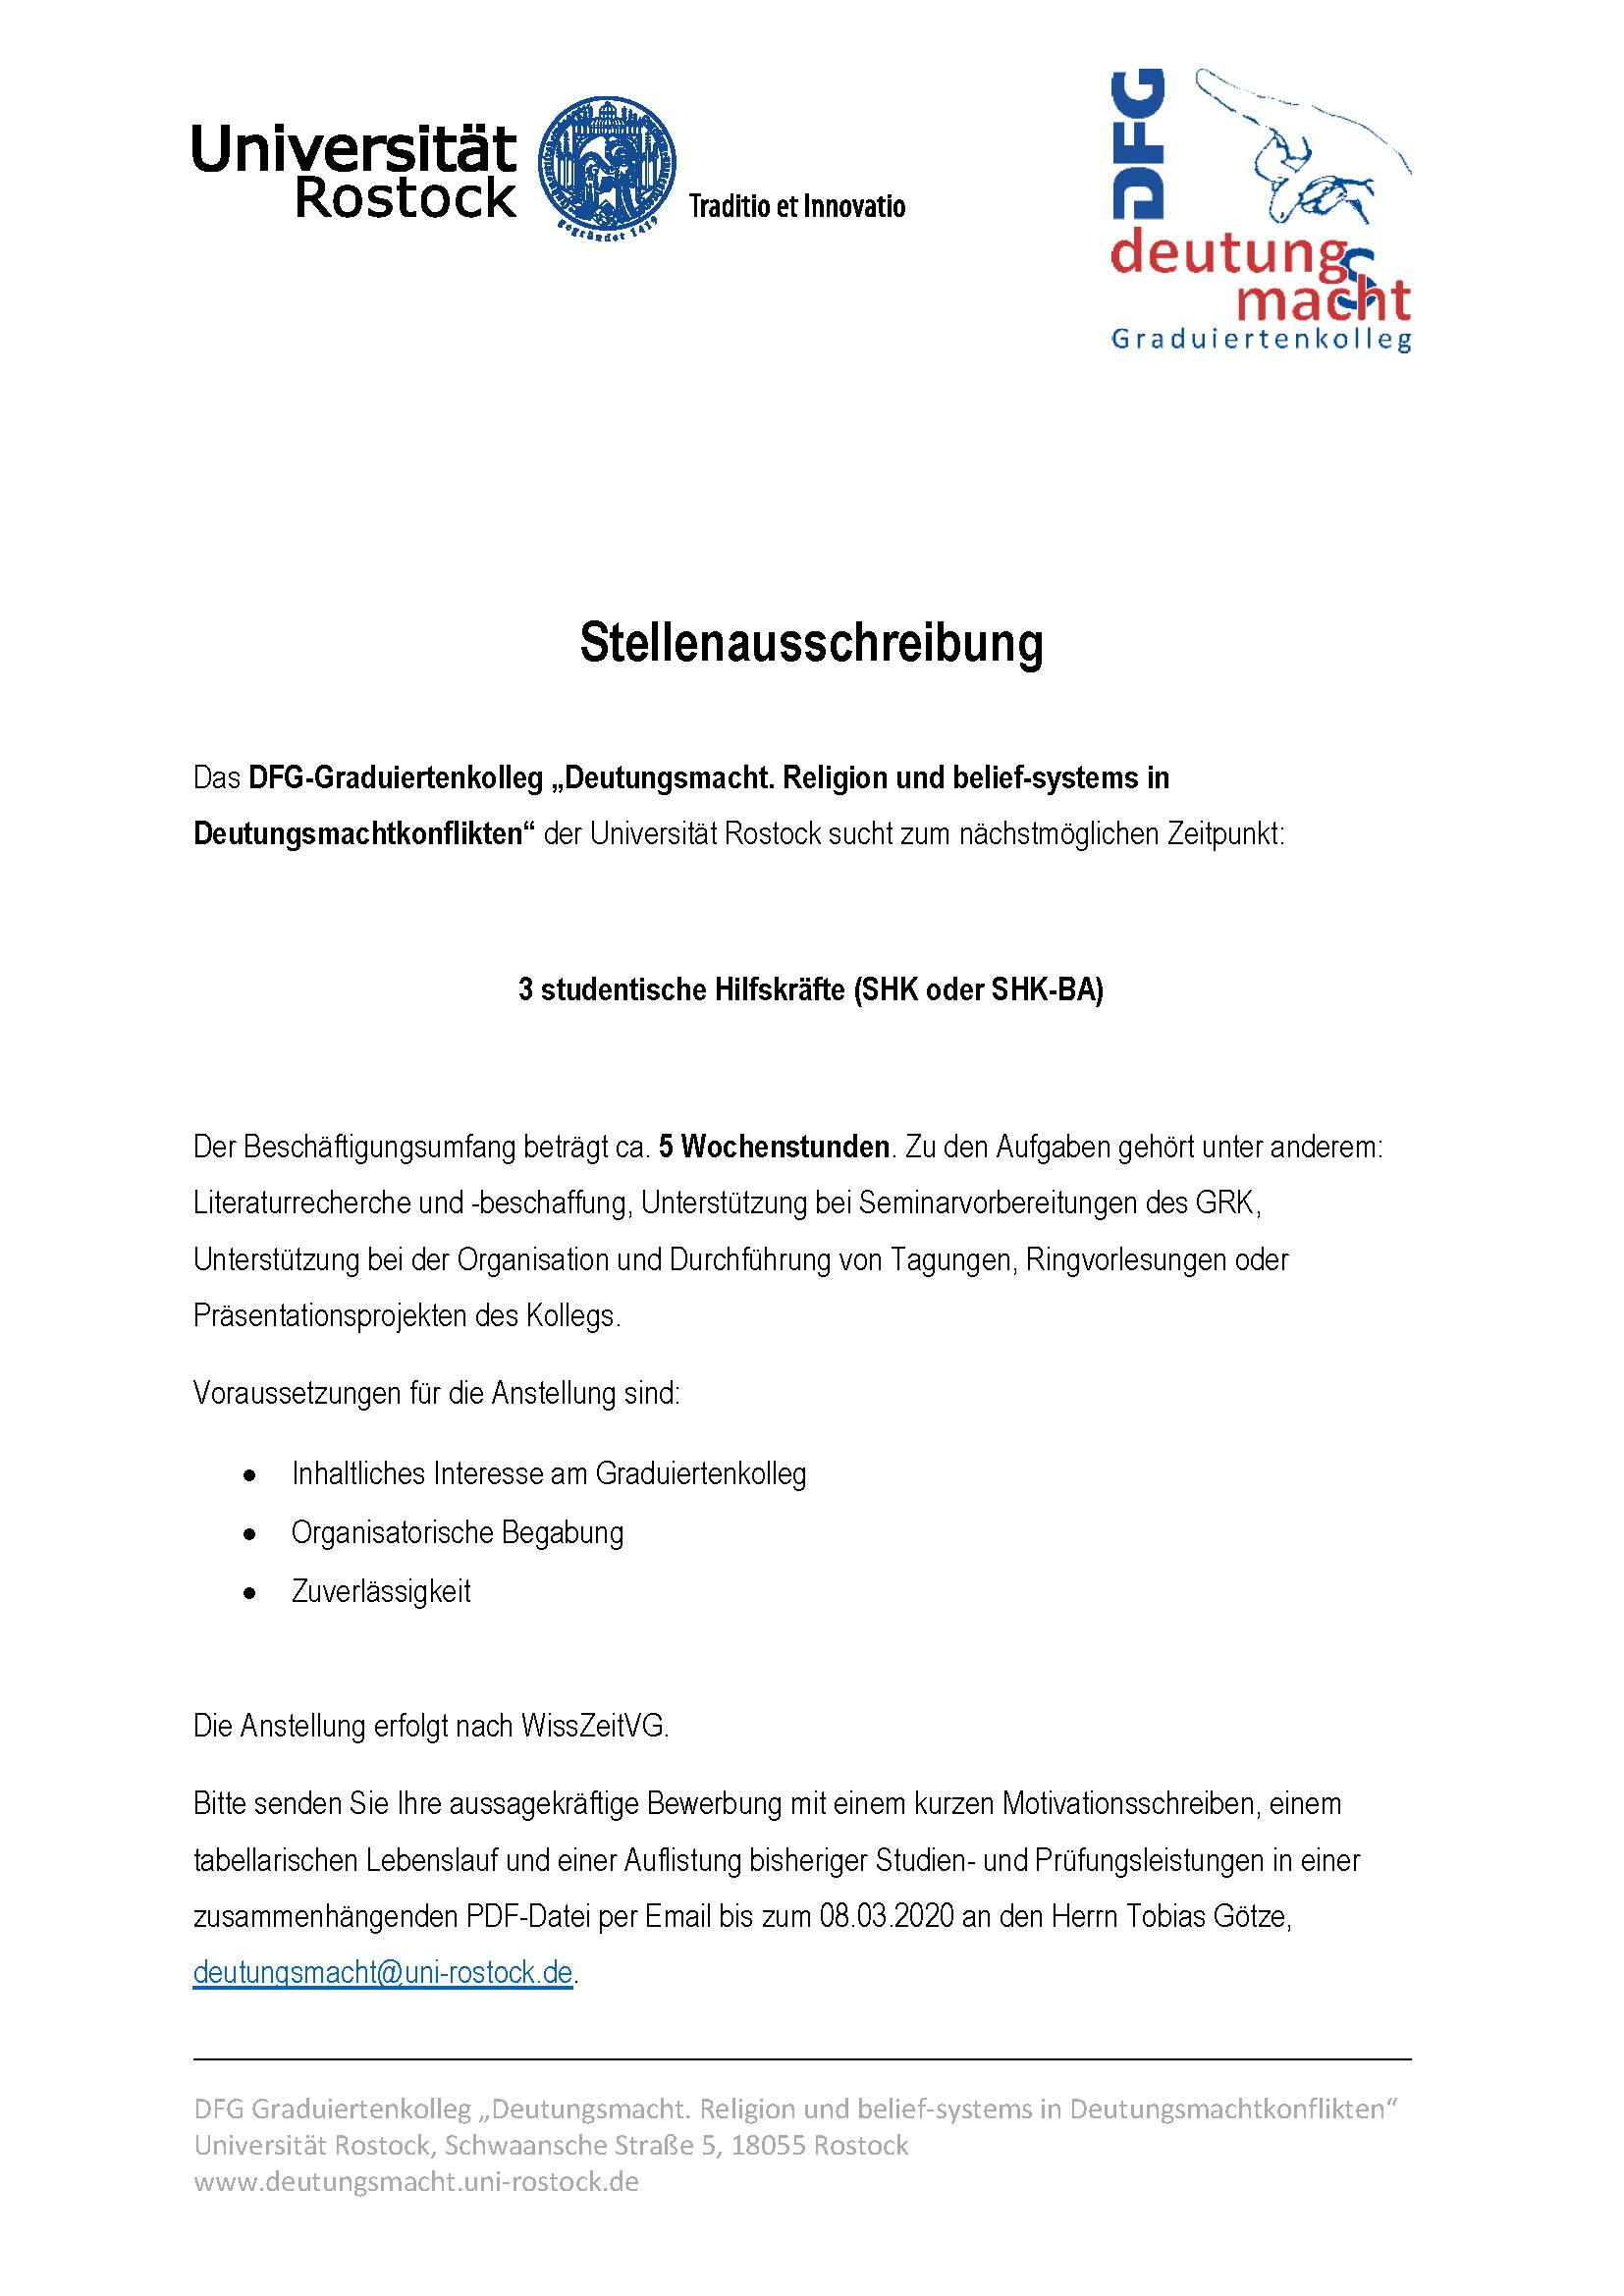 Studienplatzbewerbung Universitat Rostock